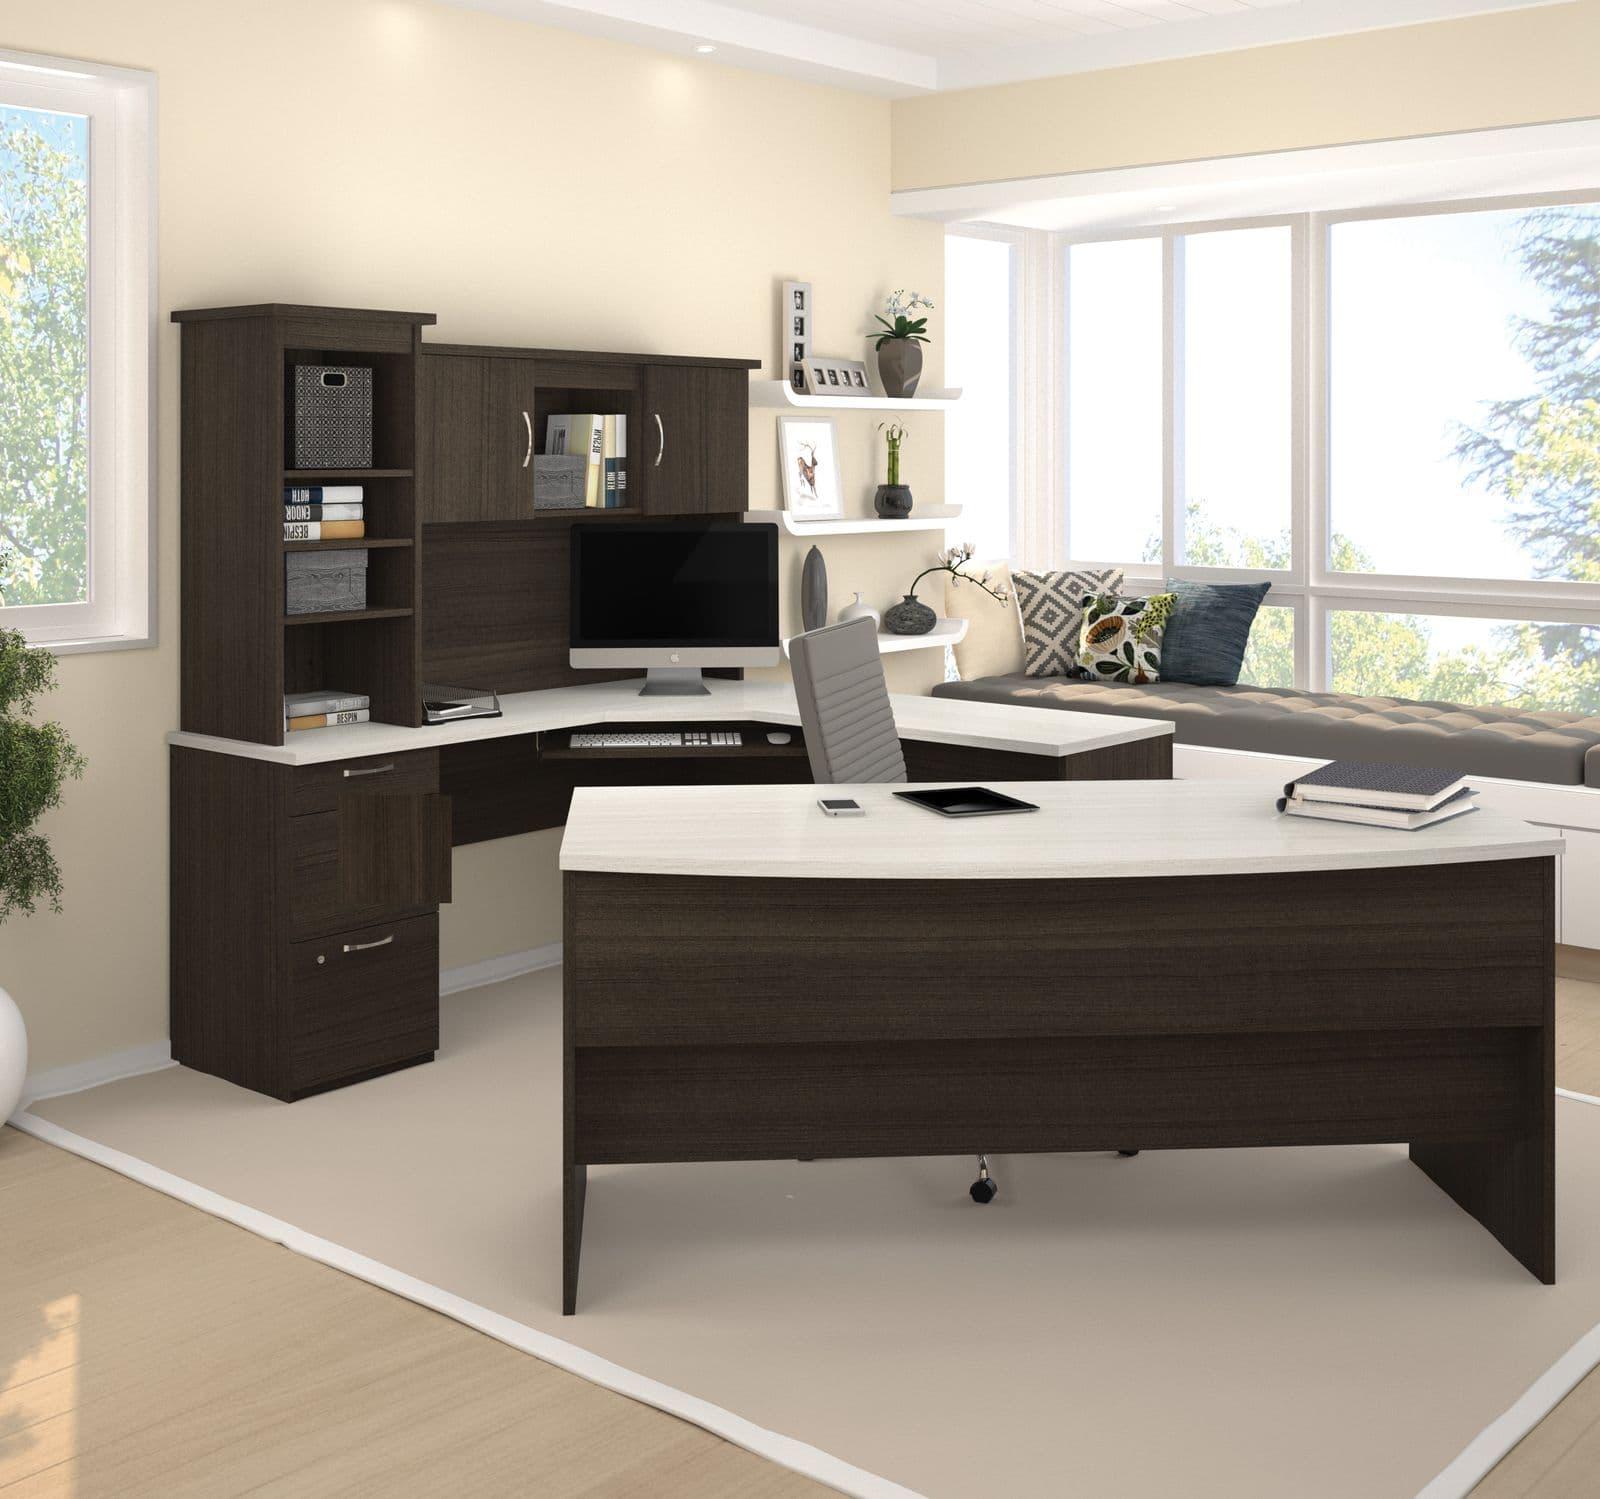 Home office with a Bestar U shaped desk set